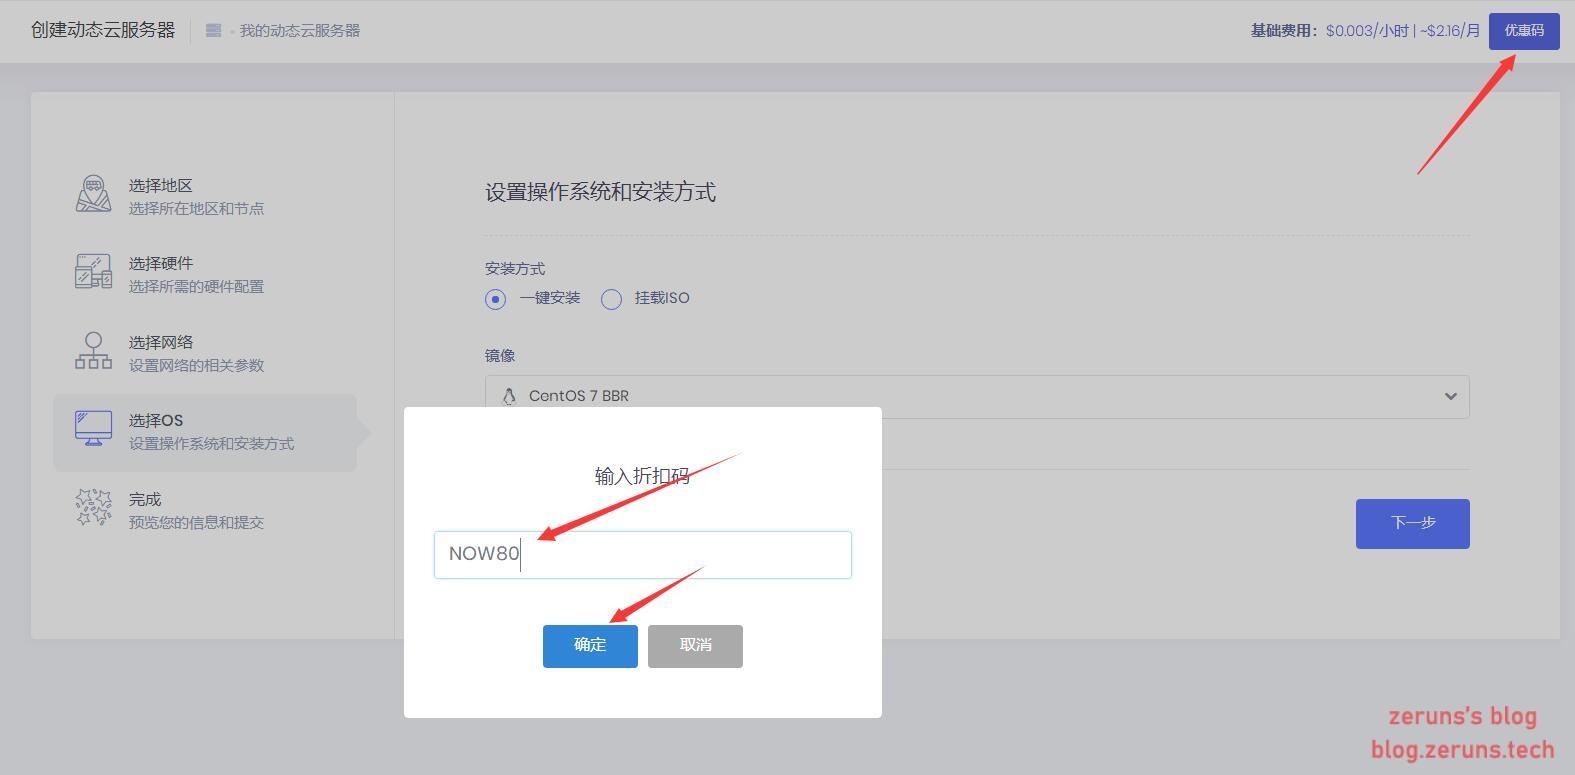 QQ20200206163108 - HostMem云服务器 $1.73/月 1核1G 100M